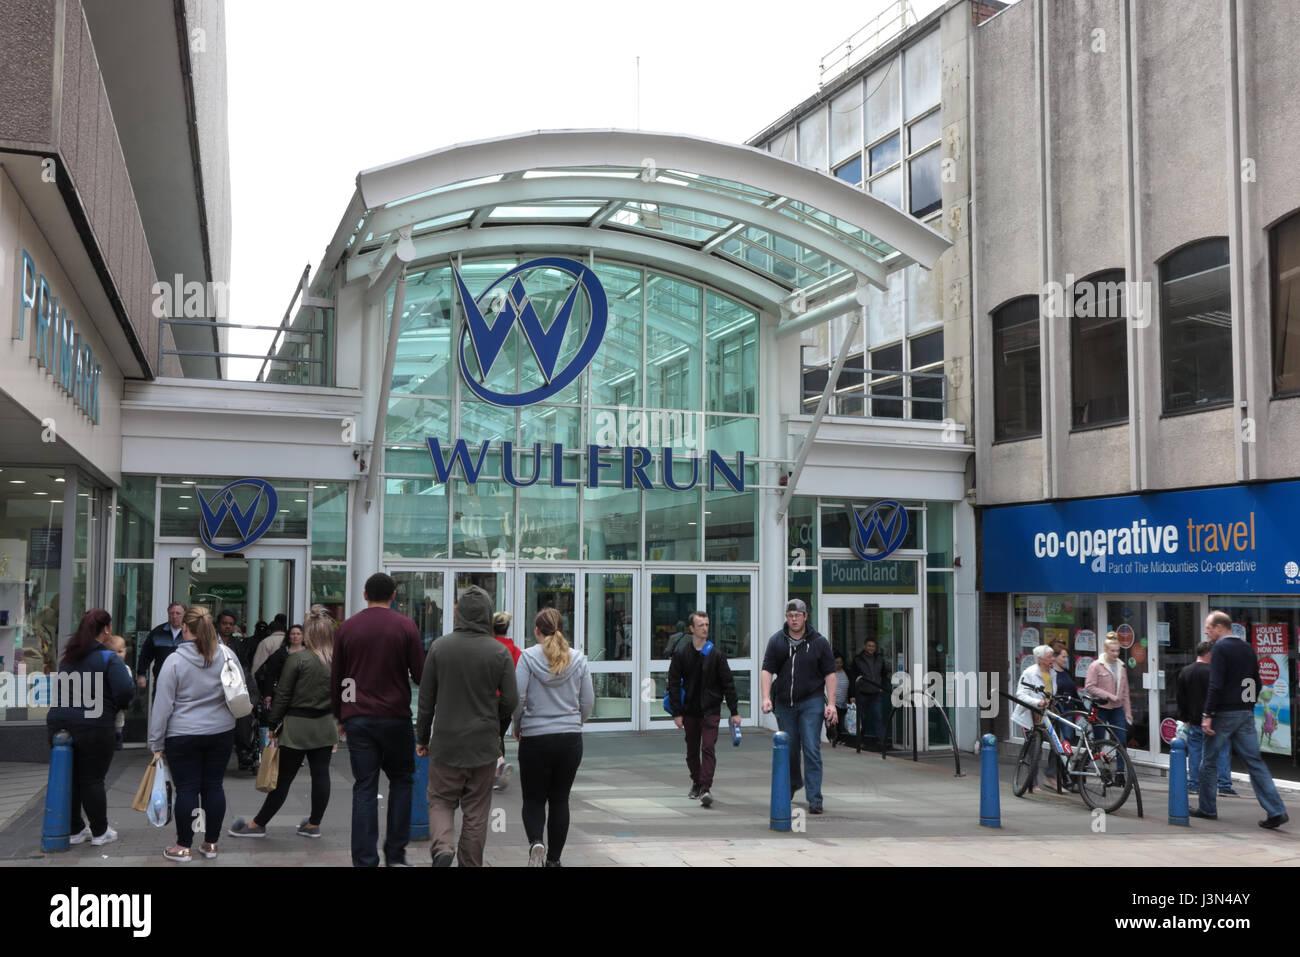 Dudley Street, Wolverhampton - Stock Image